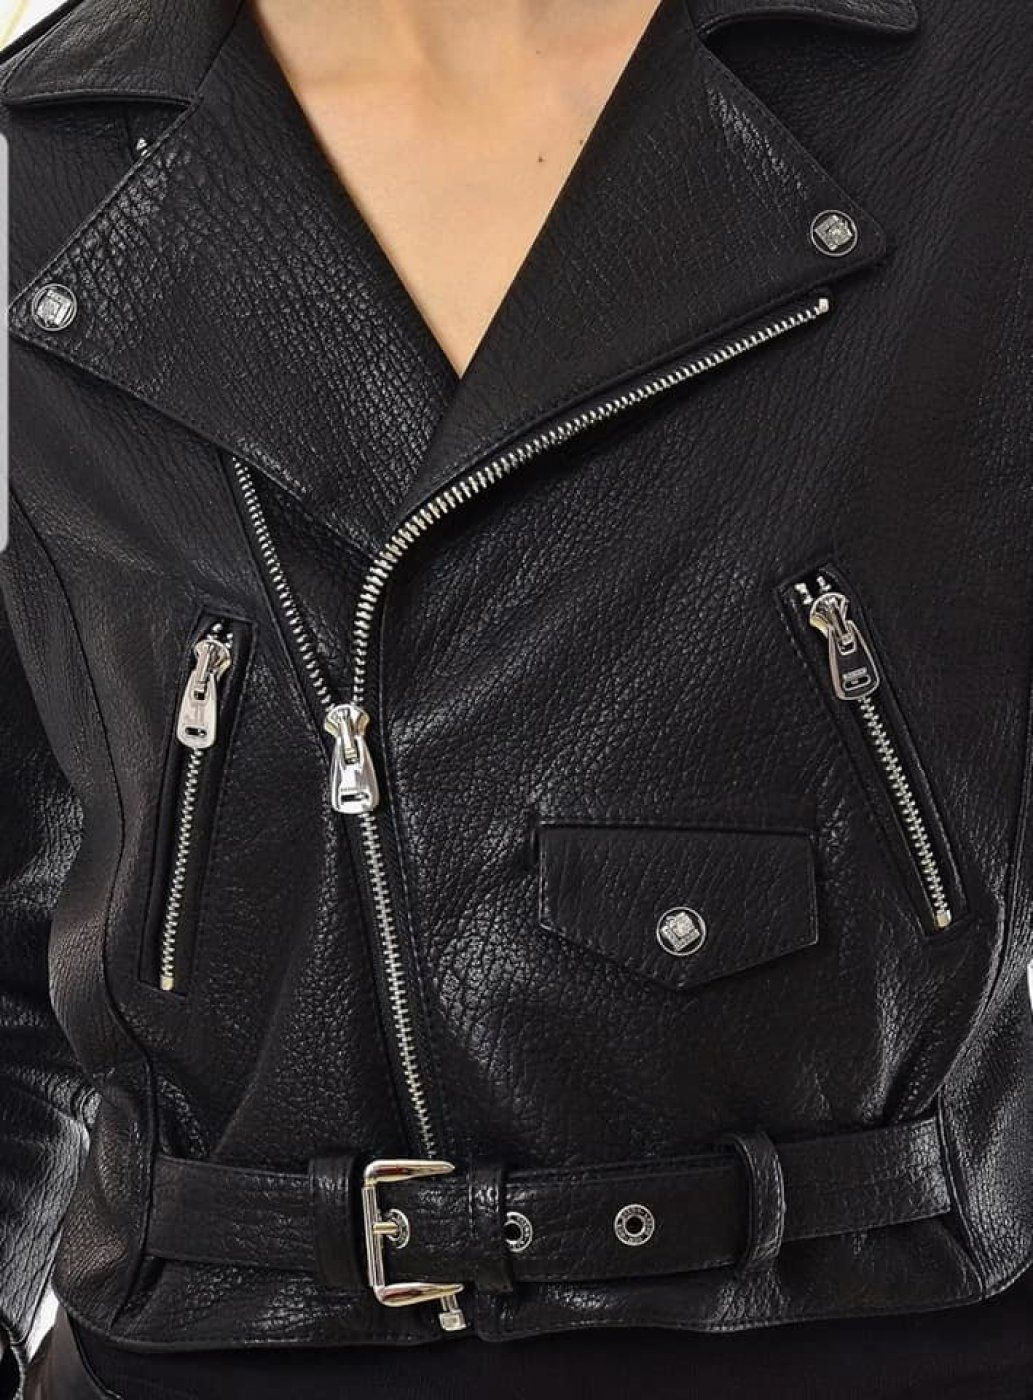 Leather Jacket Biker Jacket Size 36 Leather Jacket Jackets Biker Jacket